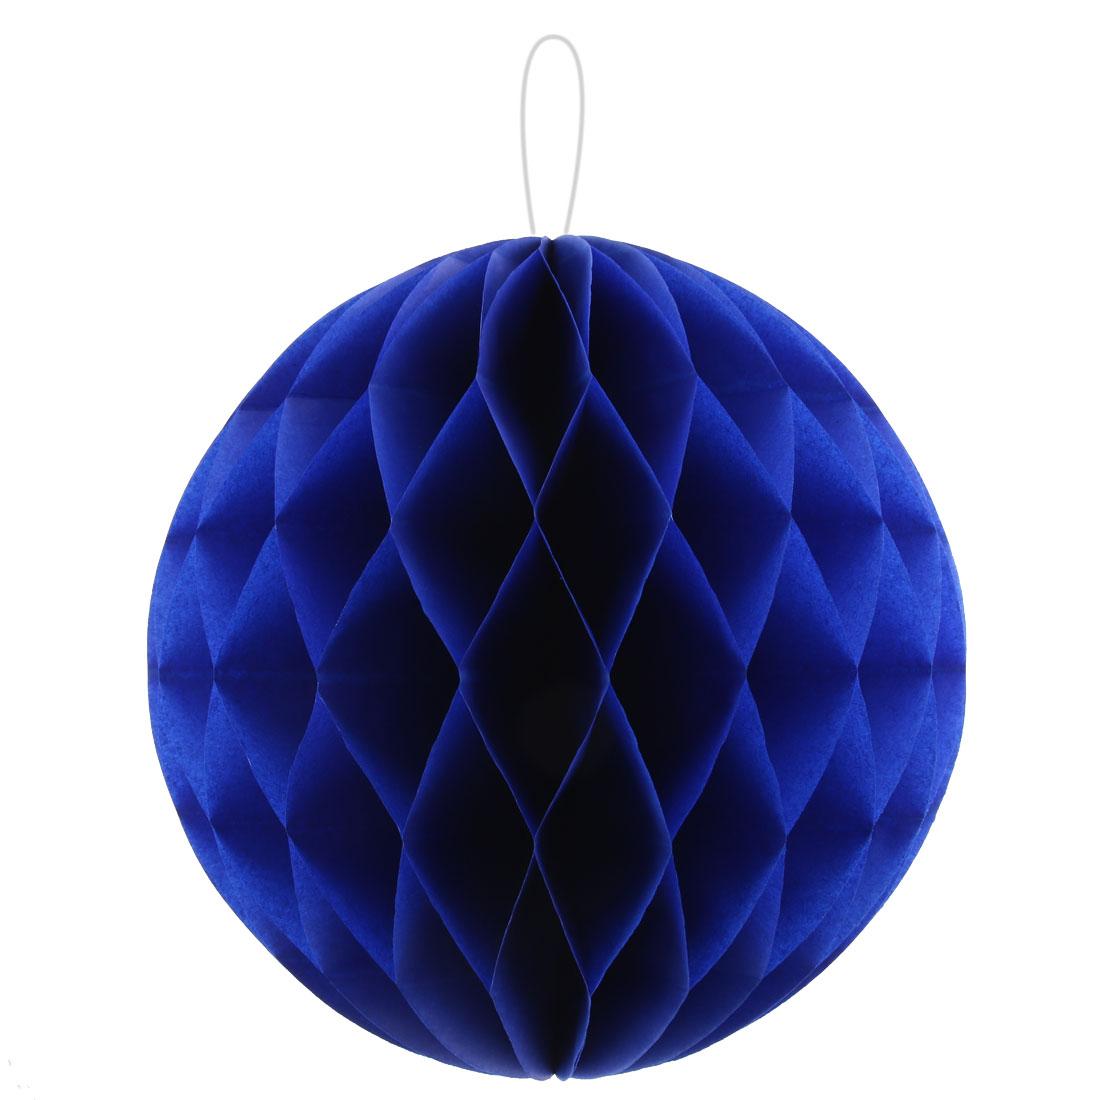 Home Paper Self-adhesive Handmade Hanging Decor Honeycomb Ball Royal Blue 12 Inch Dia